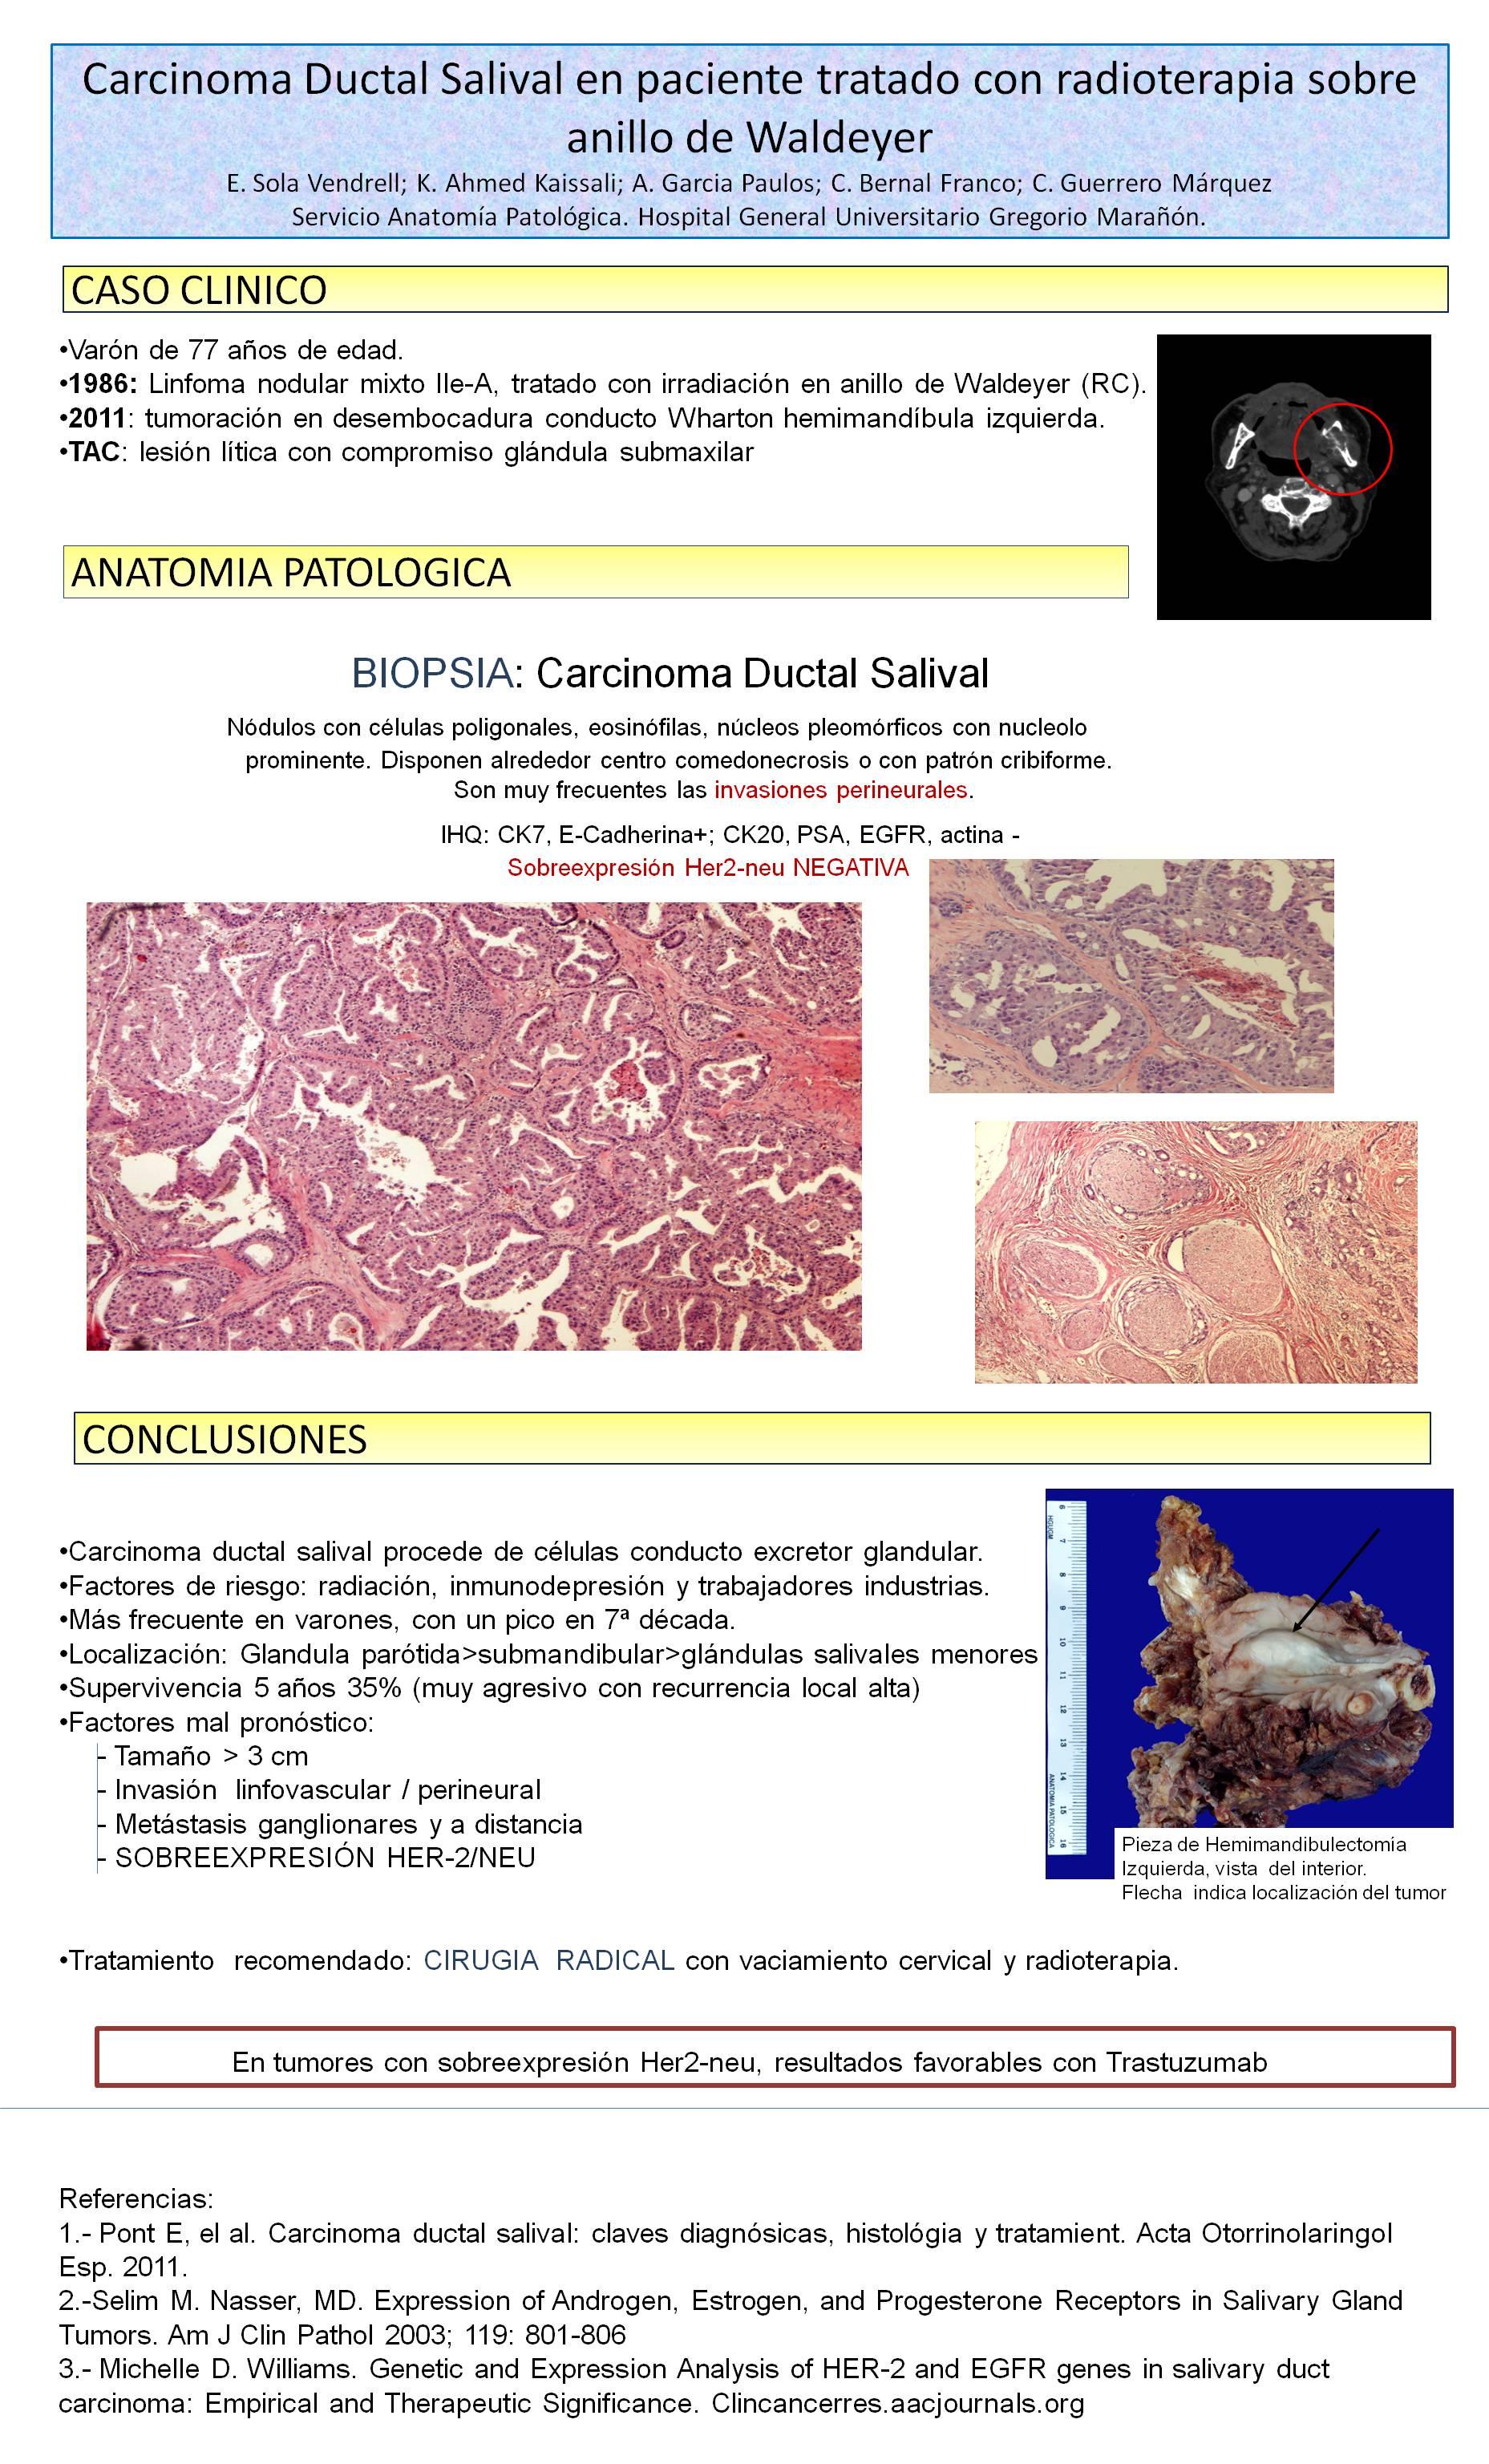 PosterXXXVSEAP018 - Carcinoma ductal salival en paciente tratado con radioterapia sobre anillo de Waldeyer